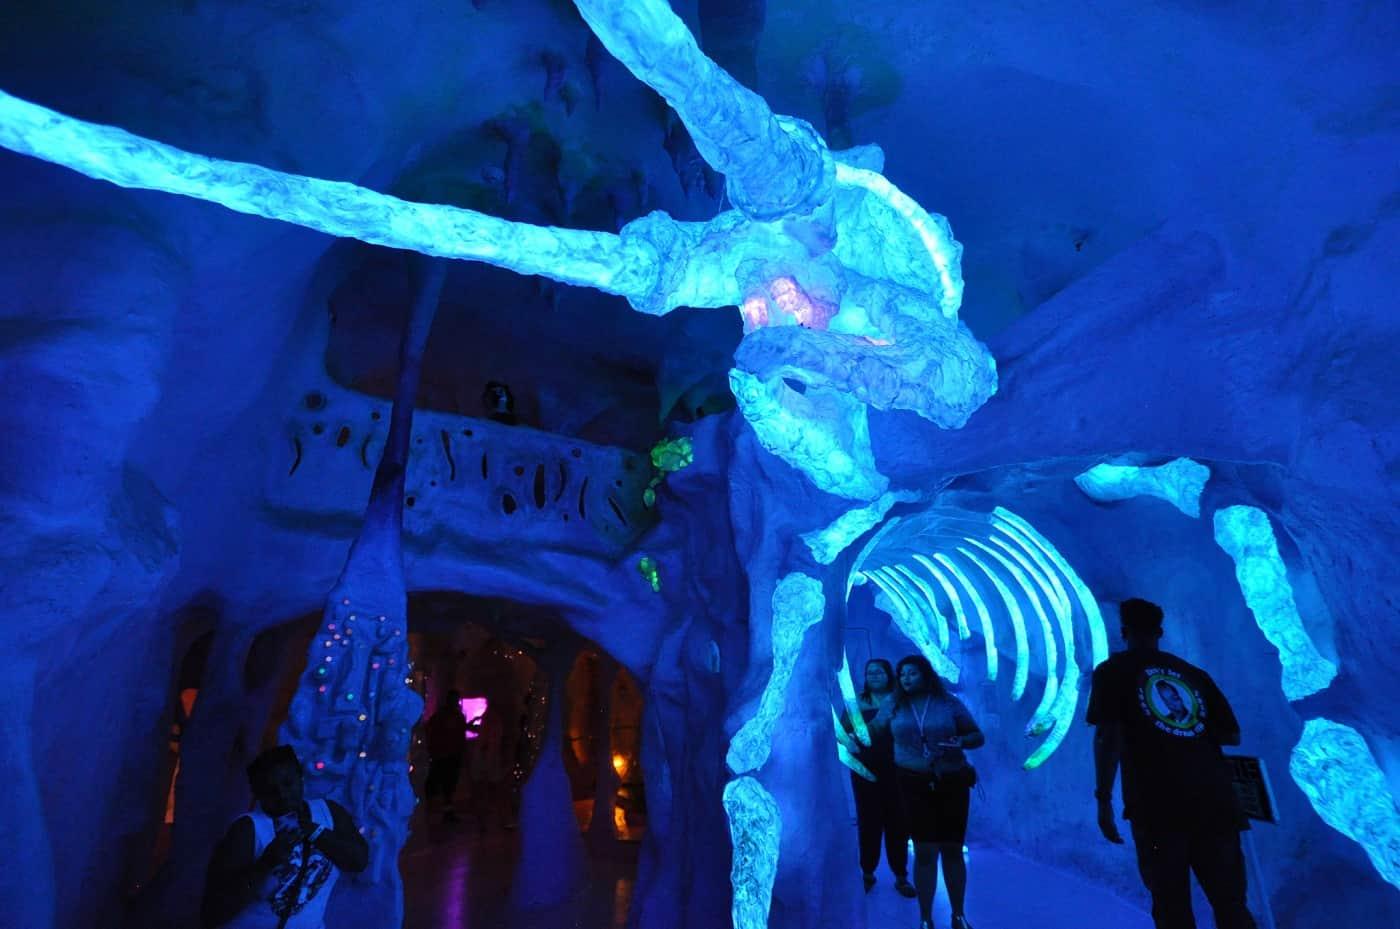 Visitors going through Meow Wolf exhibit in Santa Fe - Art reimagined